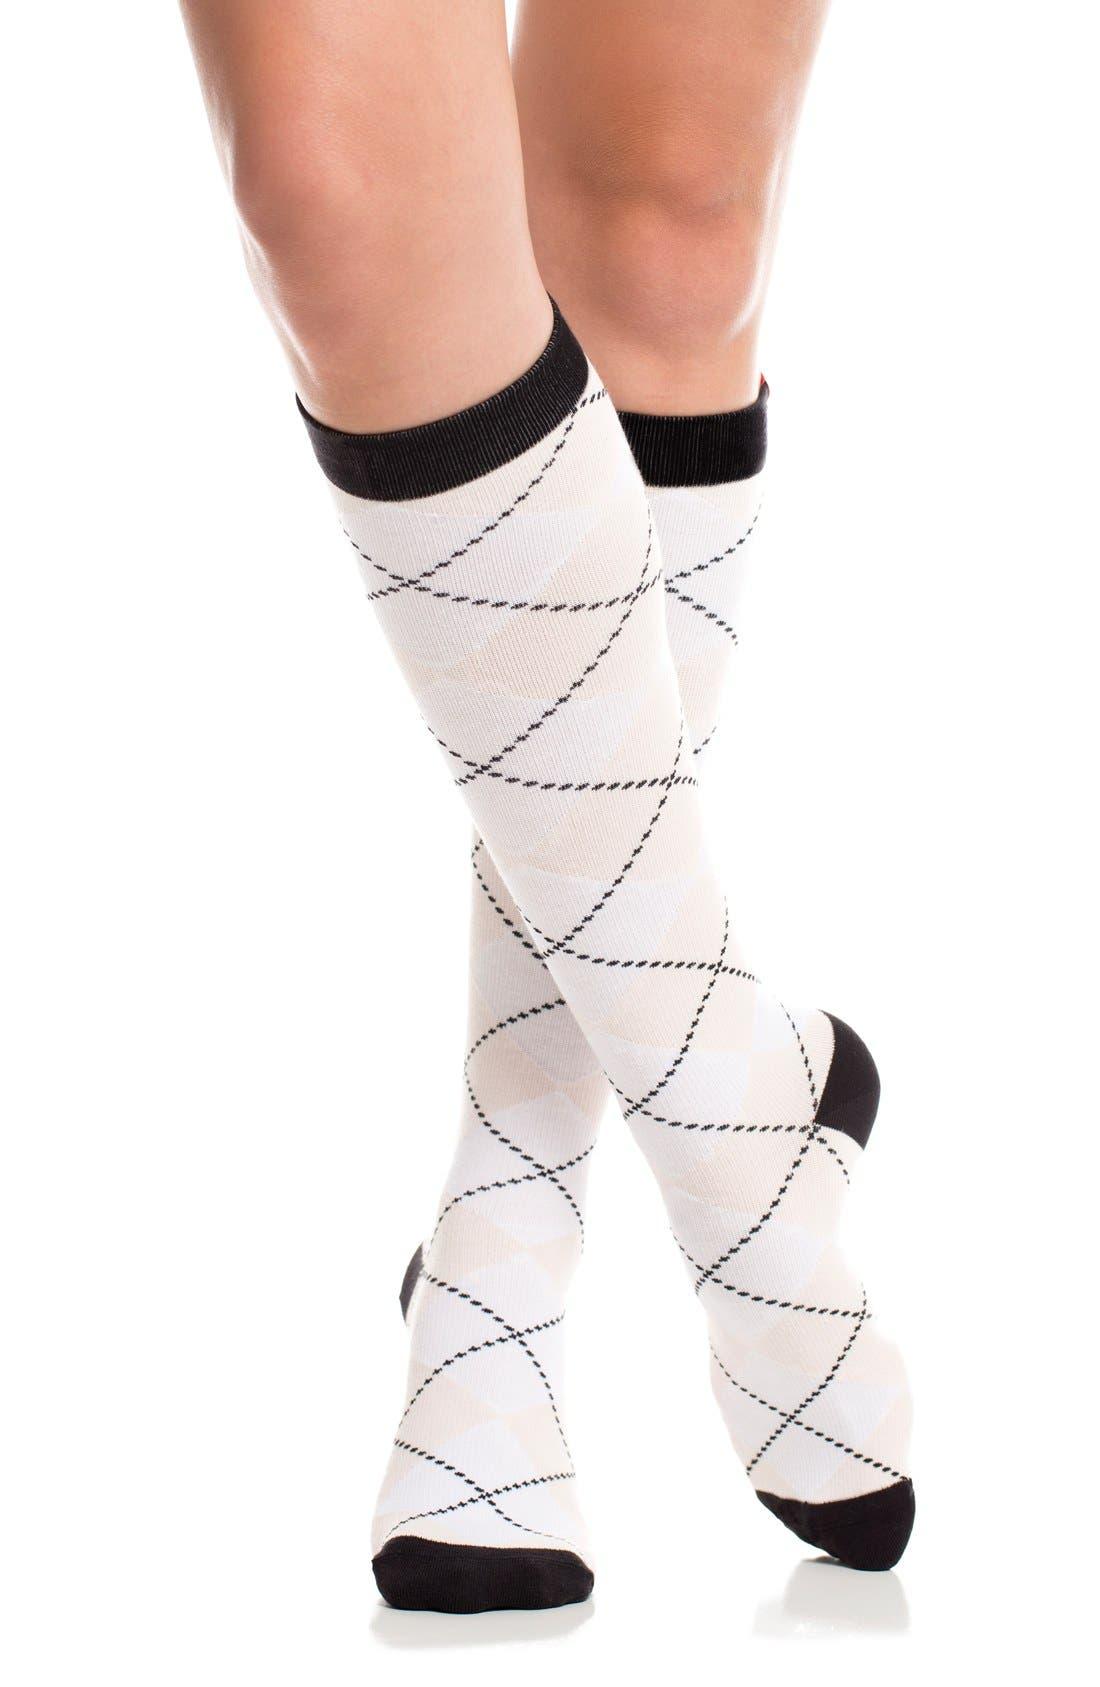 Argyle Graduated Compression Trouser Socks,                             Alternate thumbnail 2, color,                             101